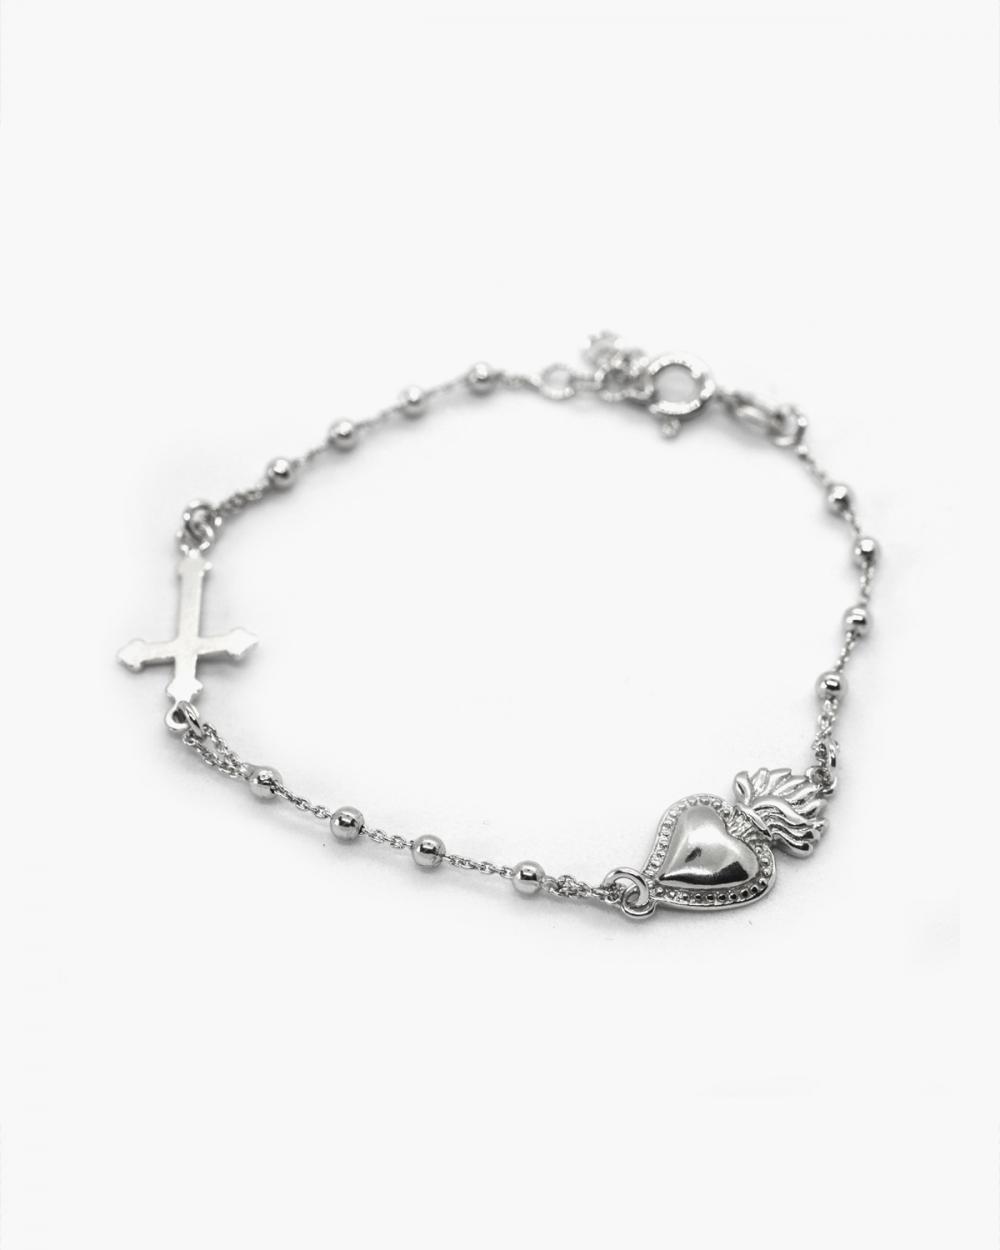 Bracelets EX-VOTO & GOTHIC CROSS ROSARY BRACELET NOVE25